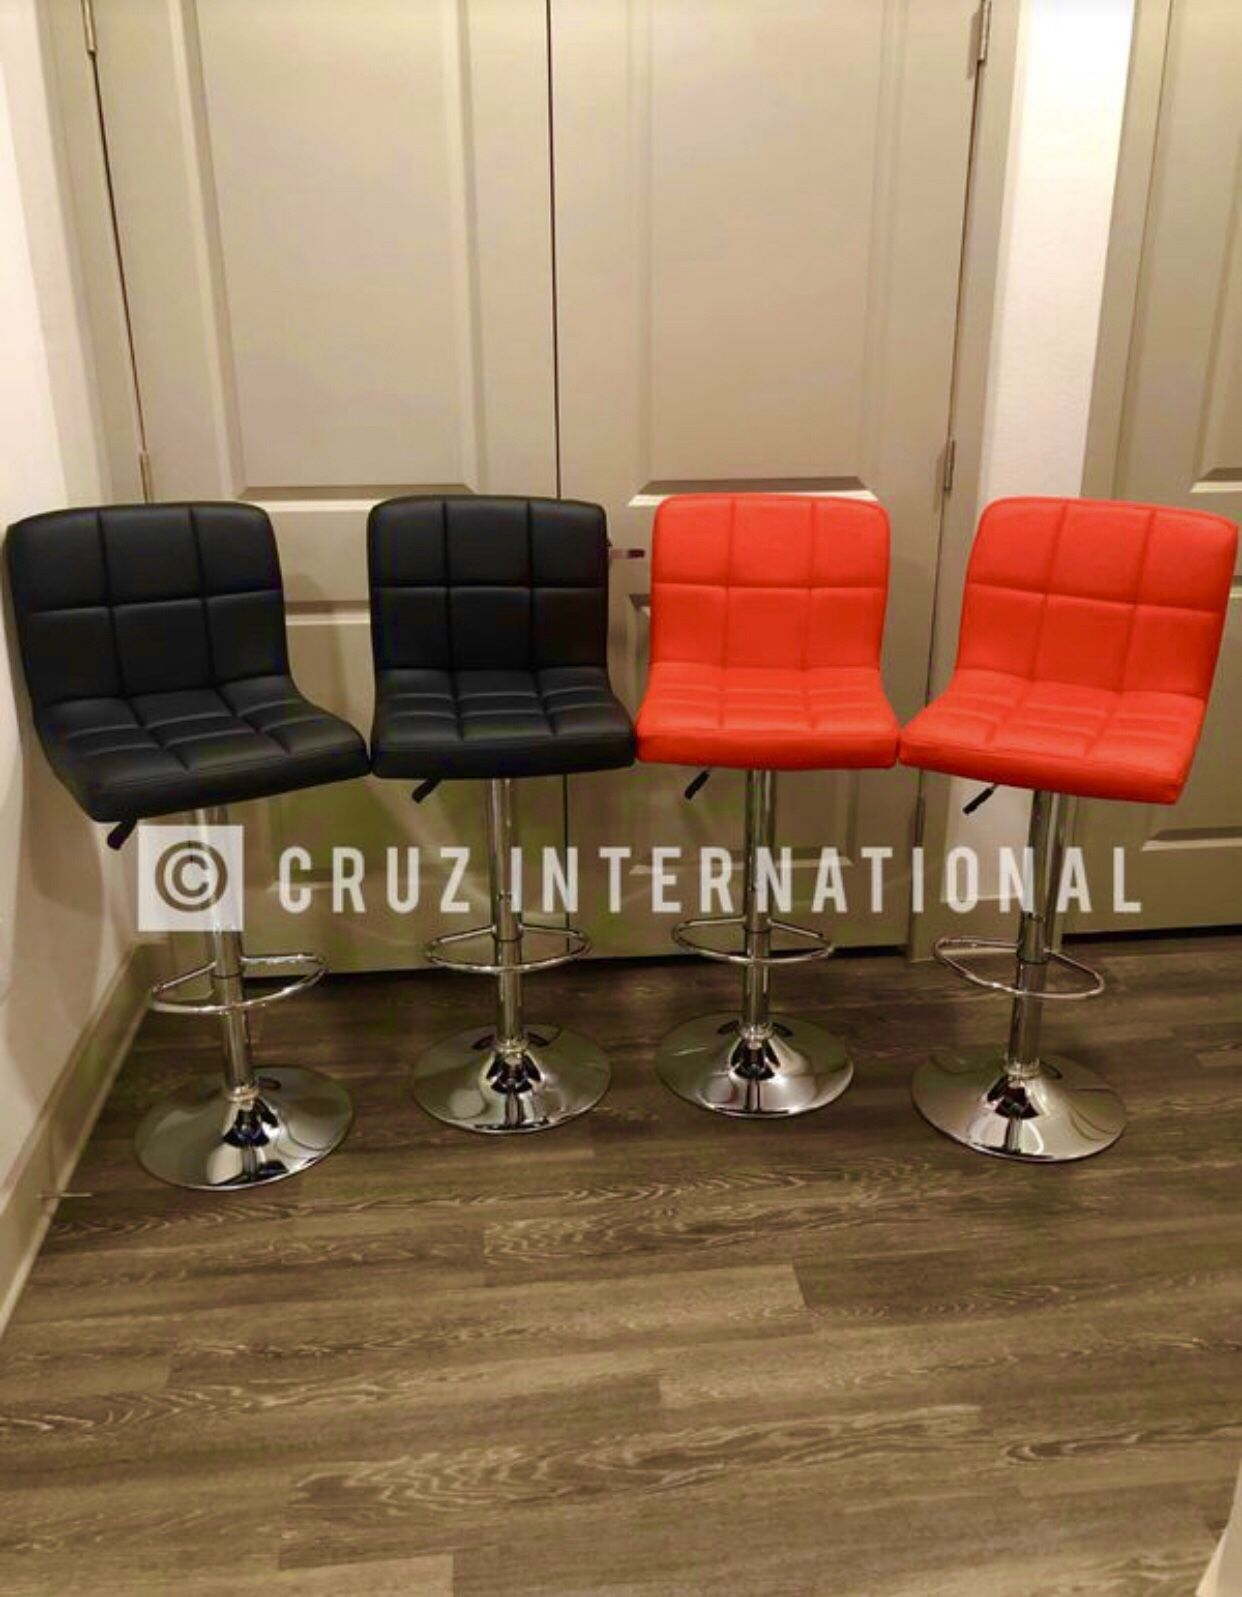 New 4 stools